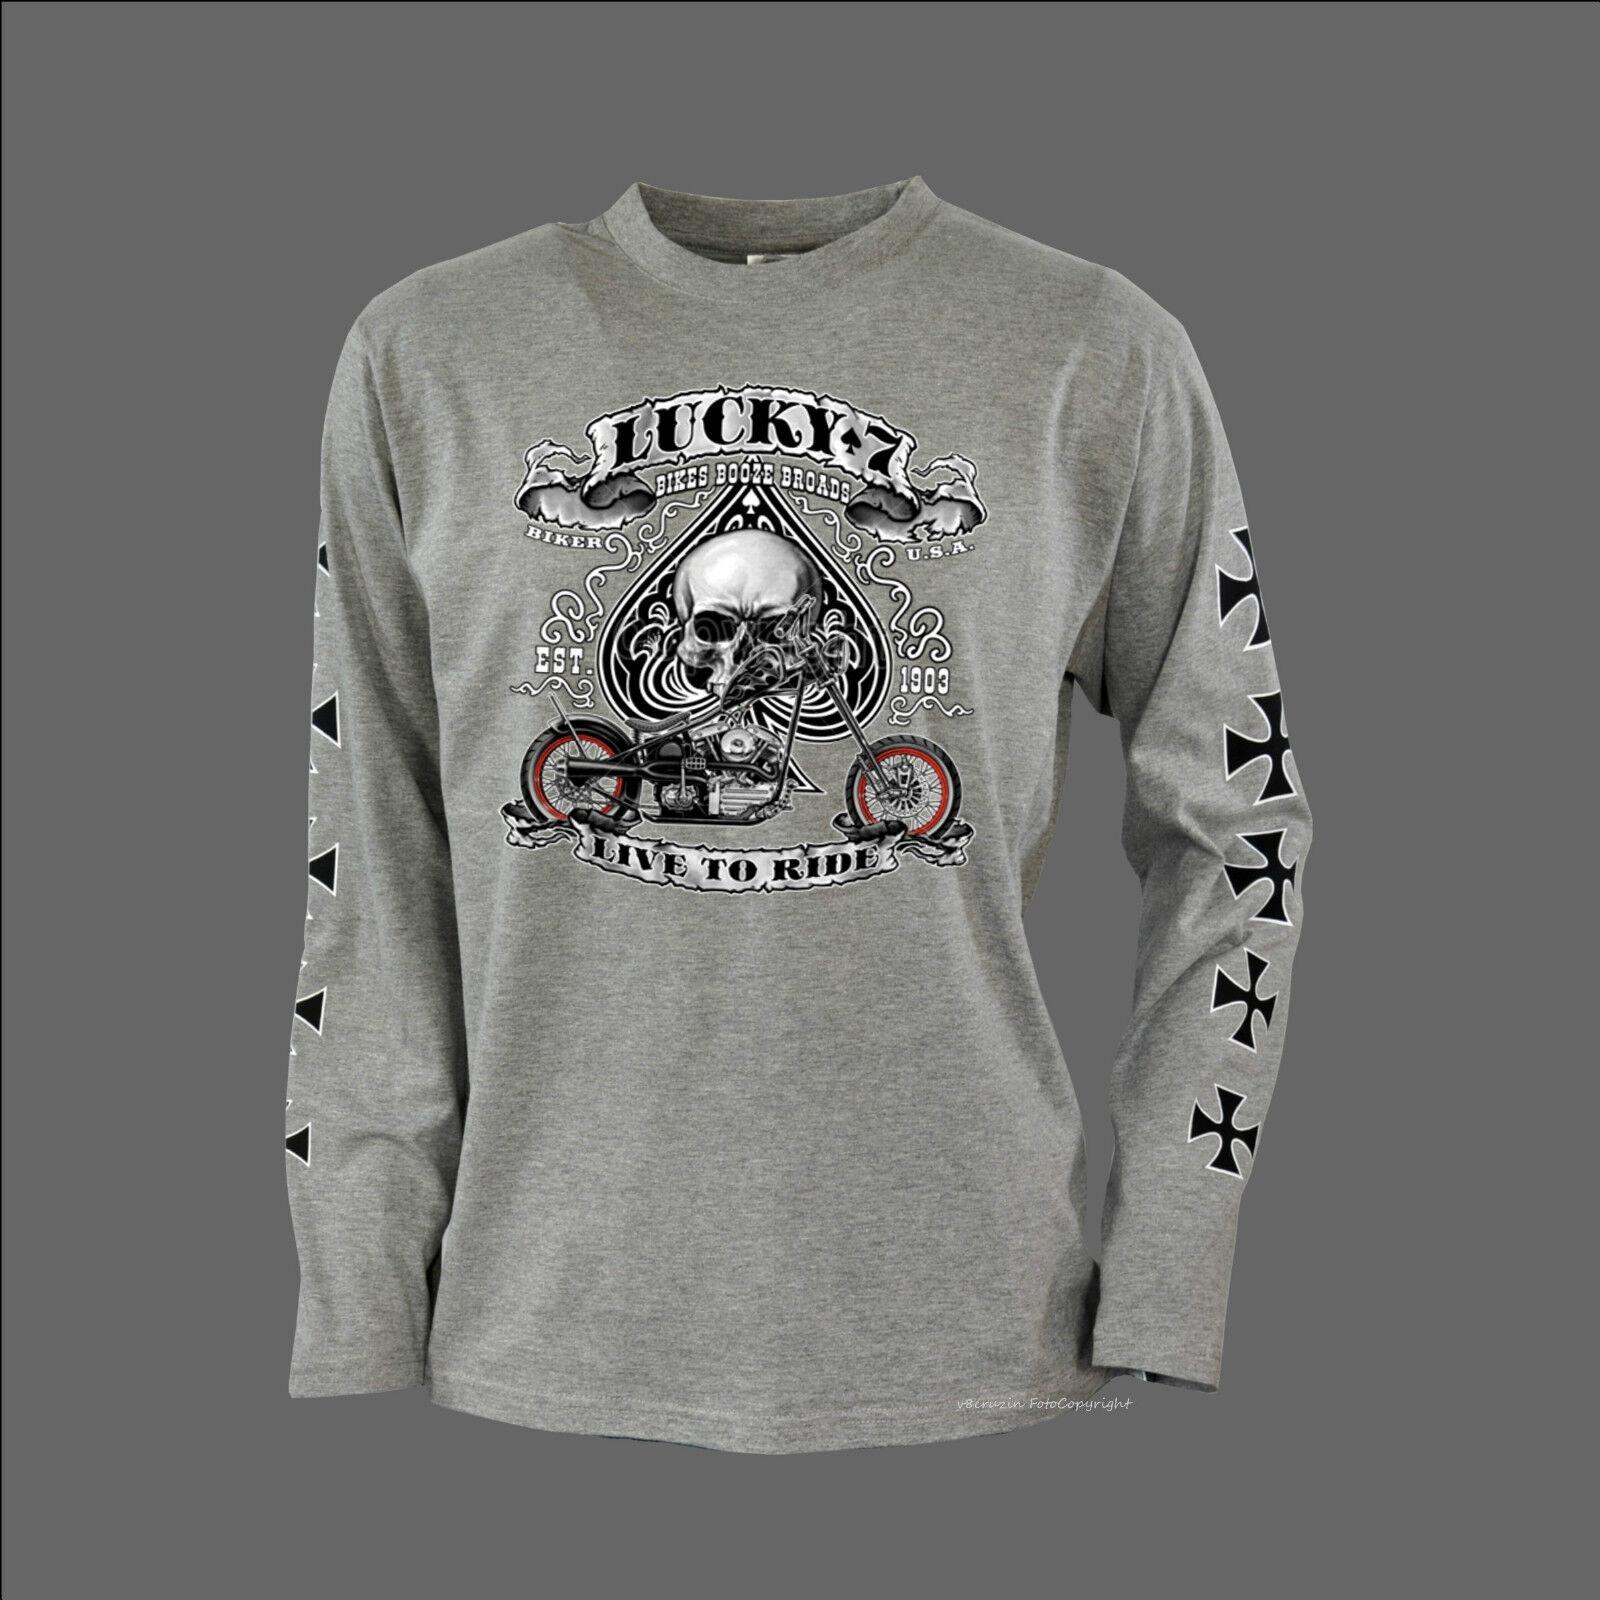 Biker T-Shirt with Arm Print Chopper Skull Motorcycle 4240 Ls